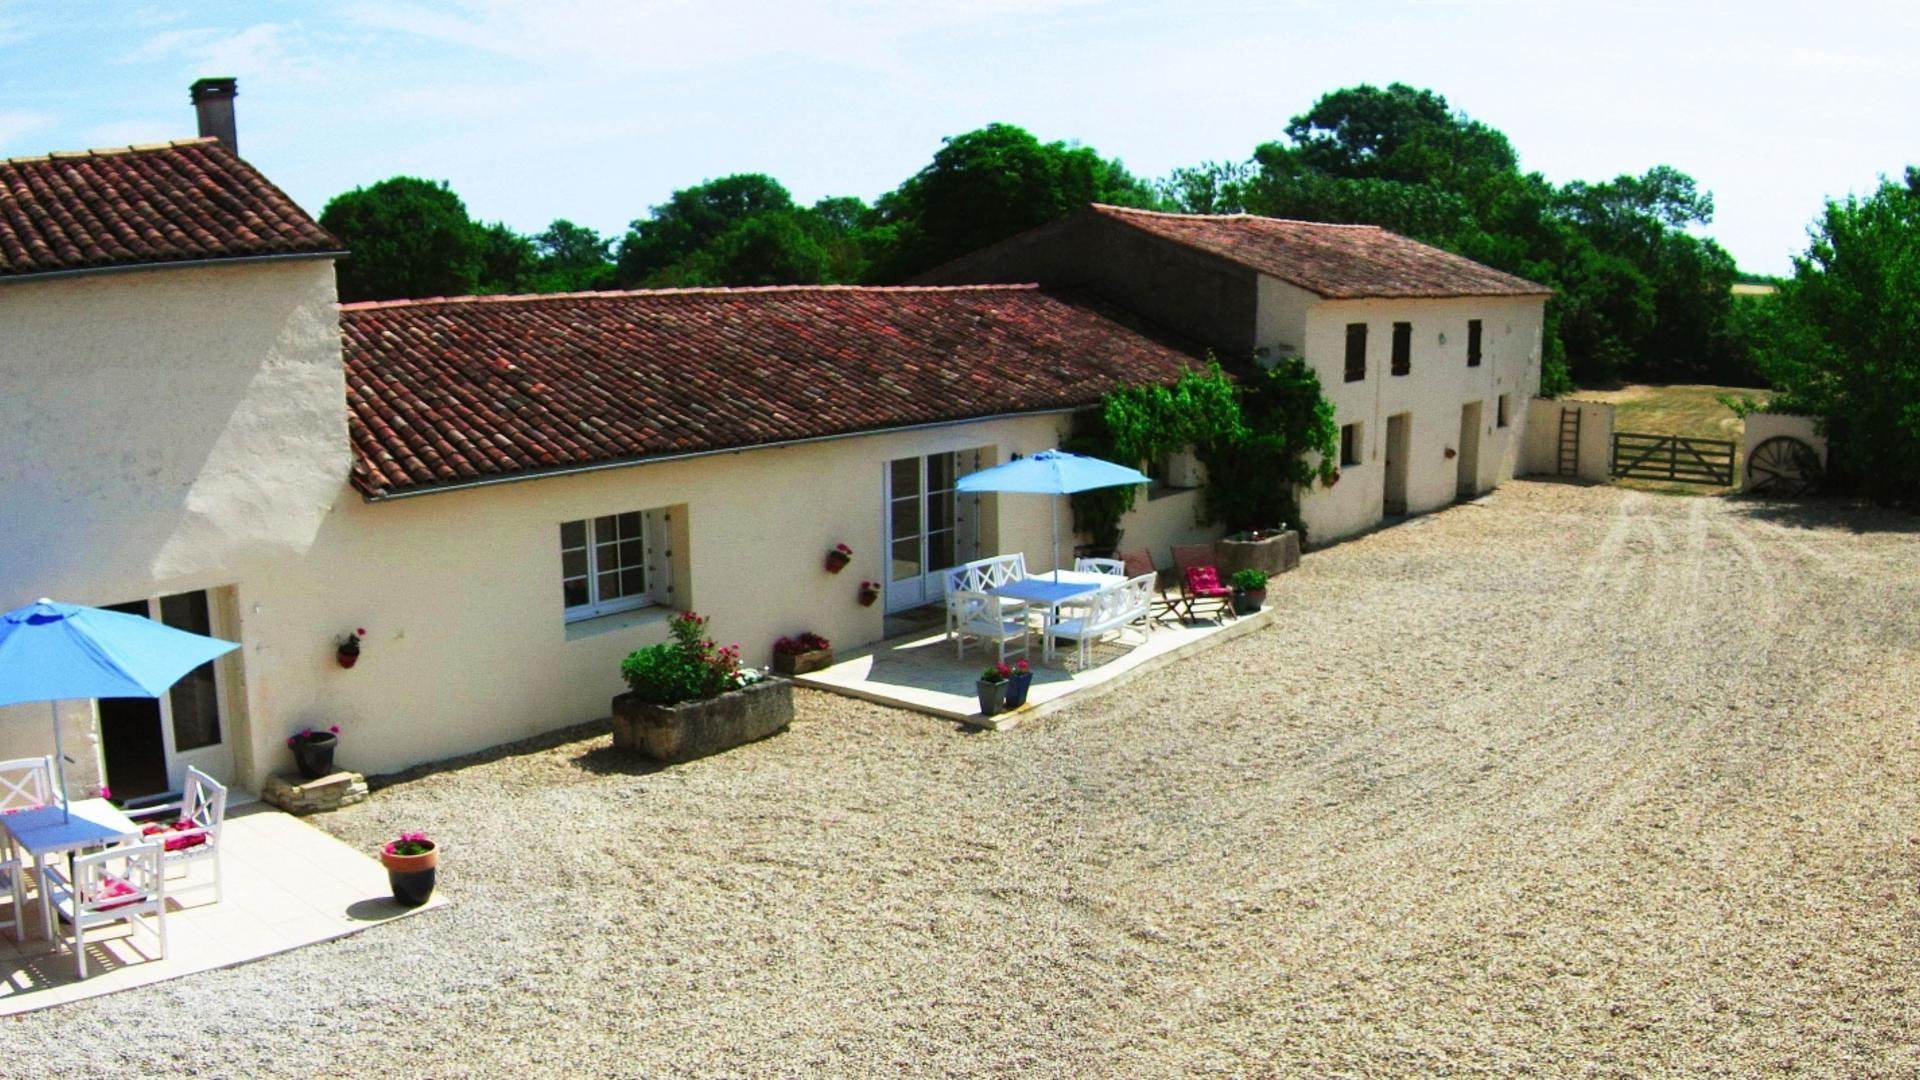 1 Bedroom Gite complex in Poitou-Charentes, France